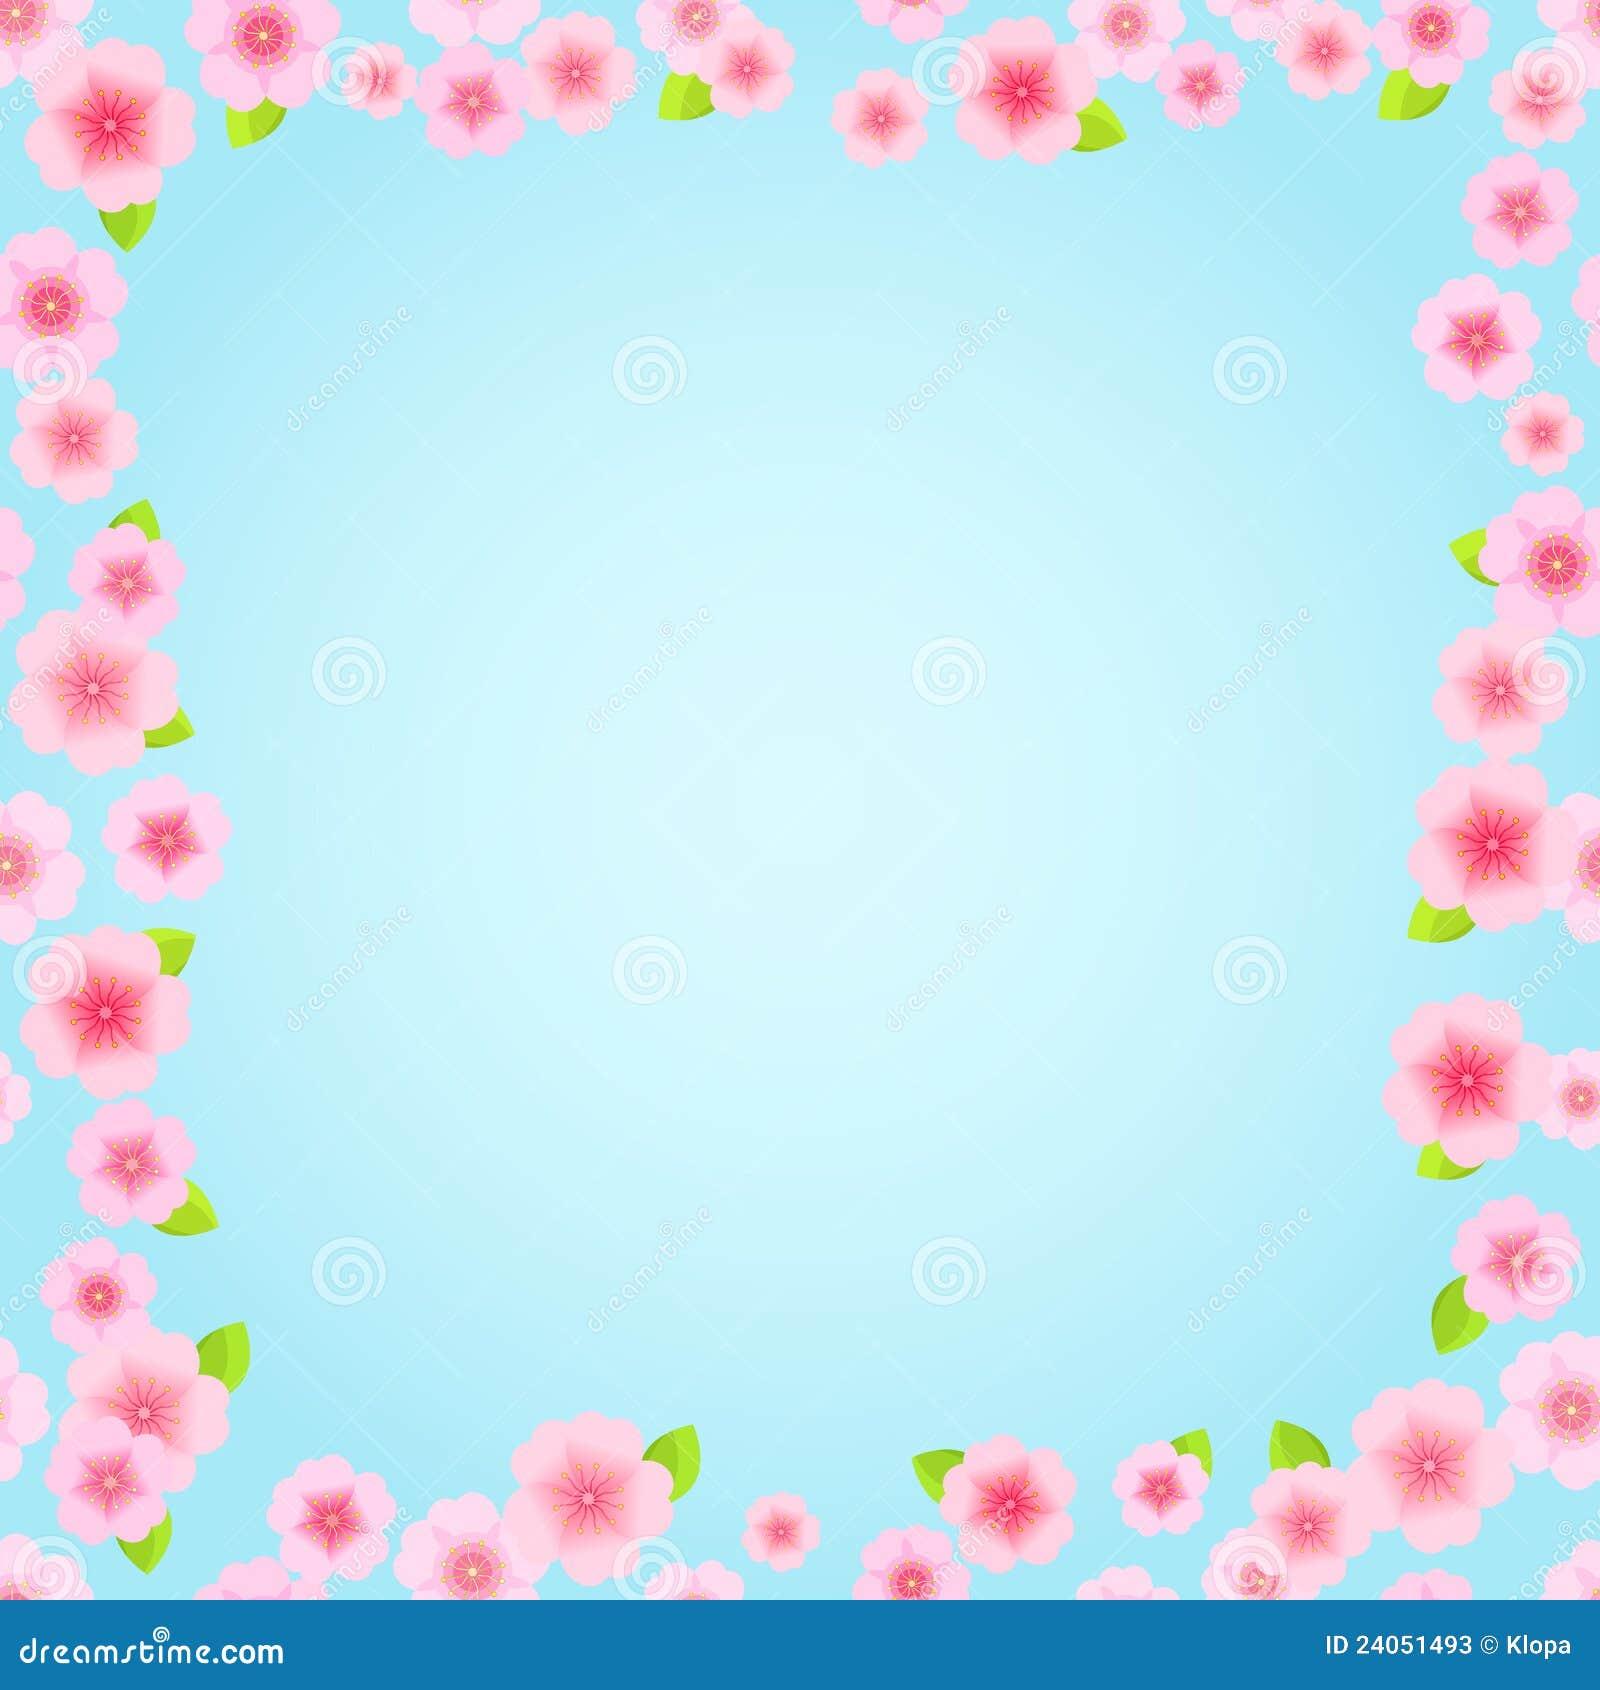 Cherry Blossom Invitations as luxury invitations template